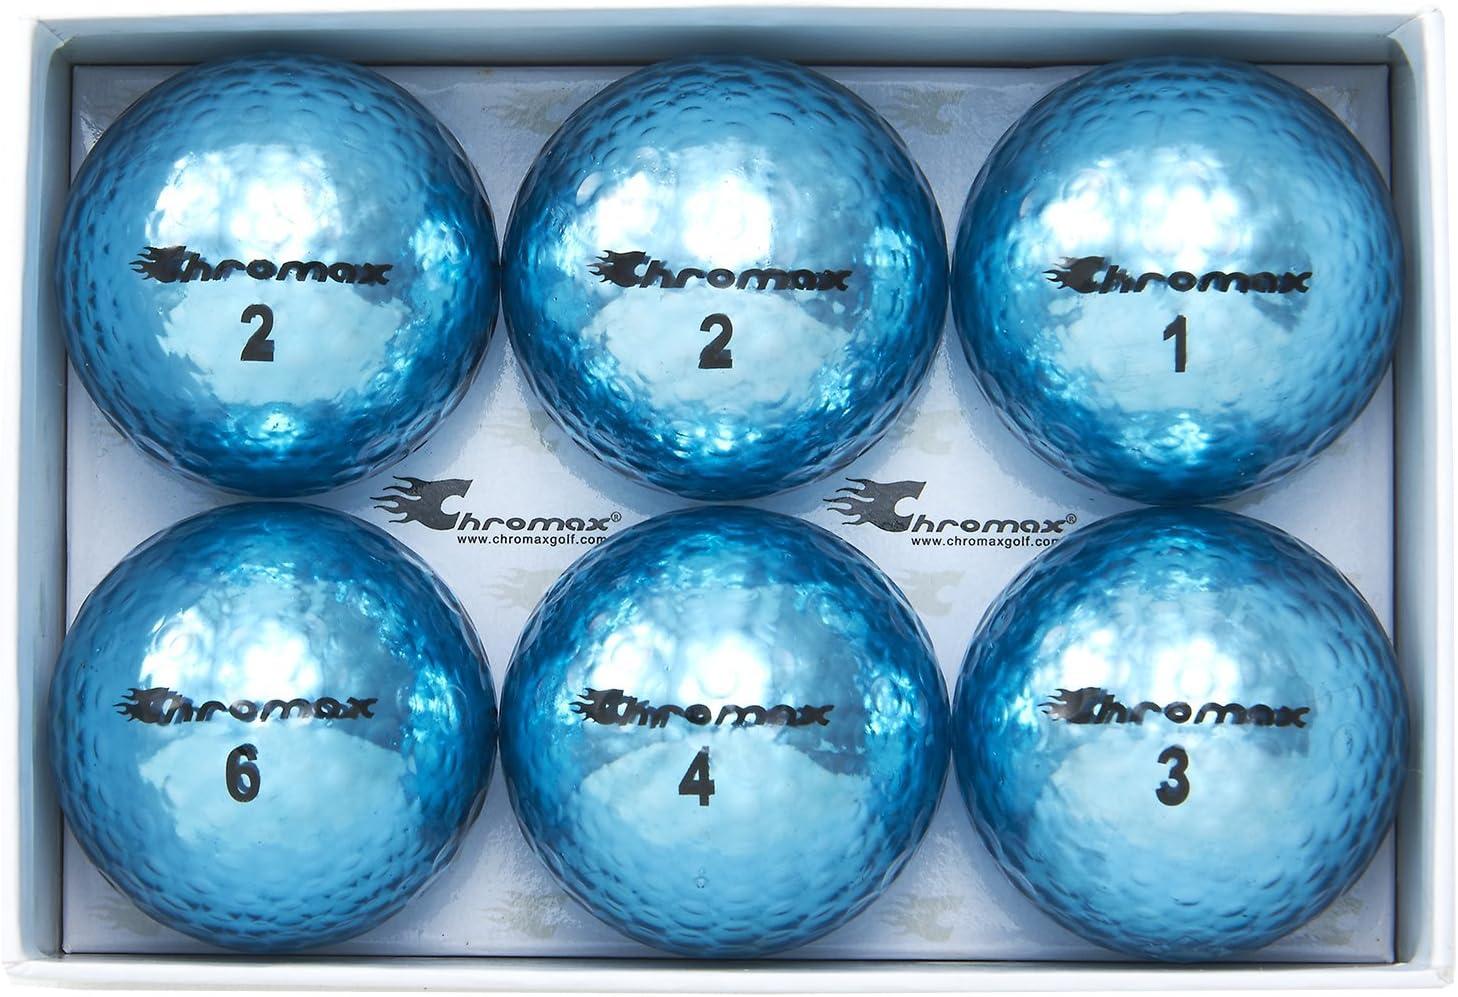 Chromax Metallic M5 Colored Golf Balls